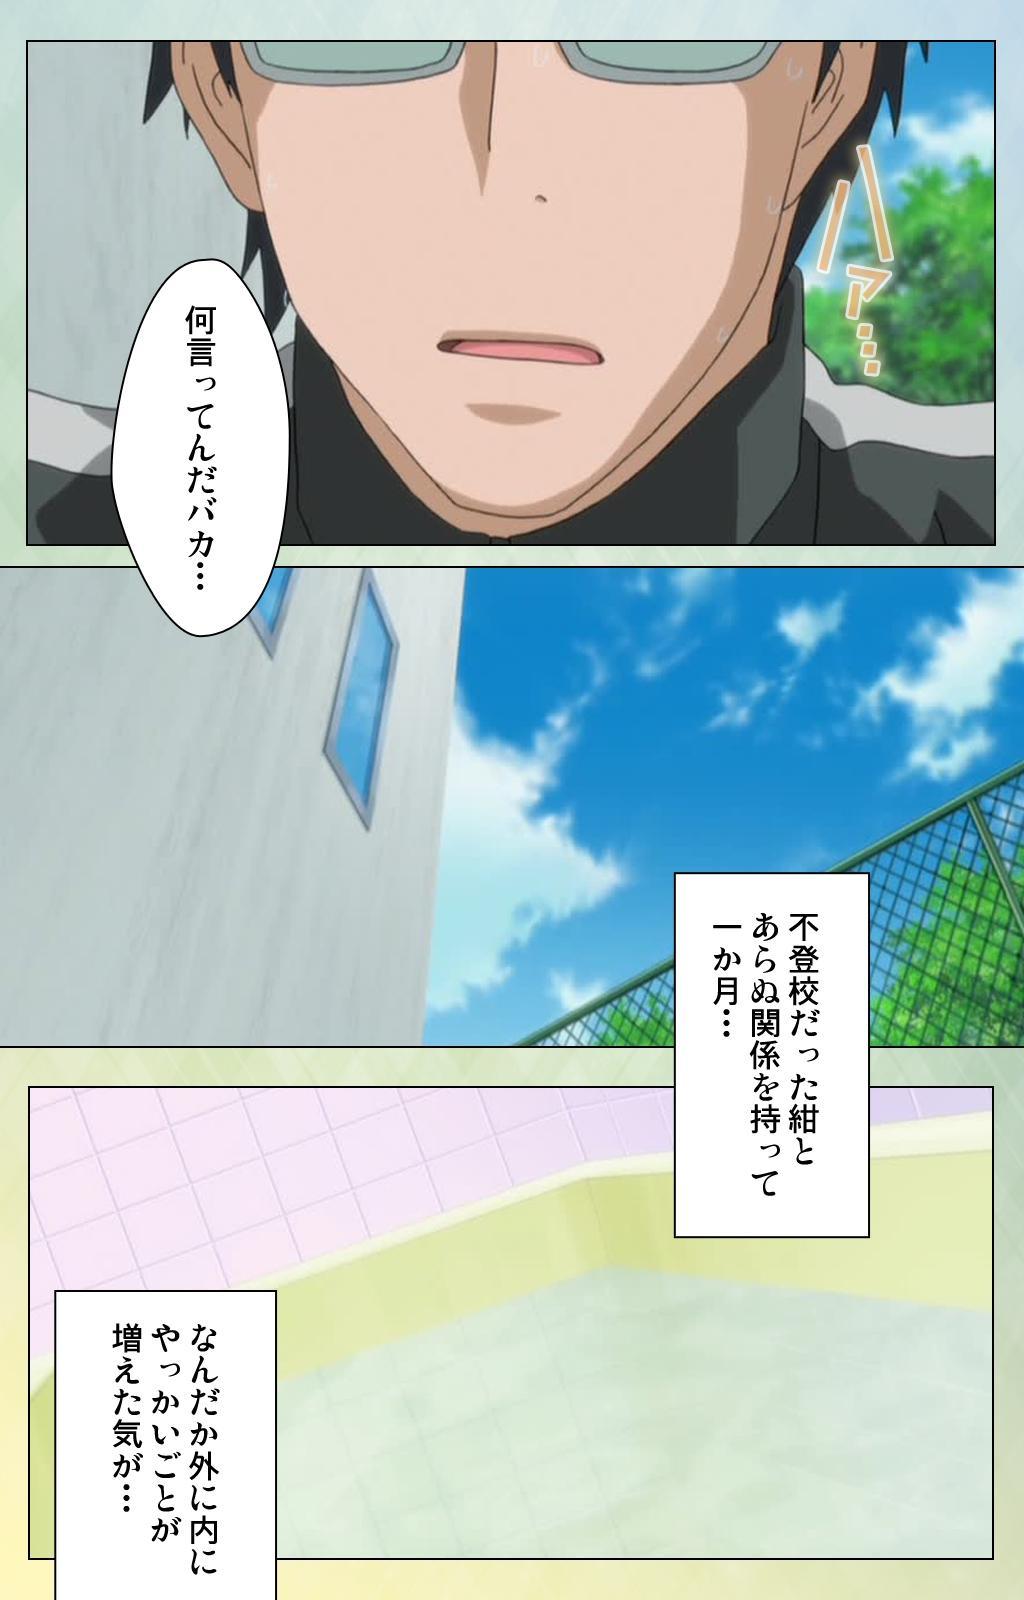 Furueru Kuchibiru fuzzy lips0 Complete Ban 45